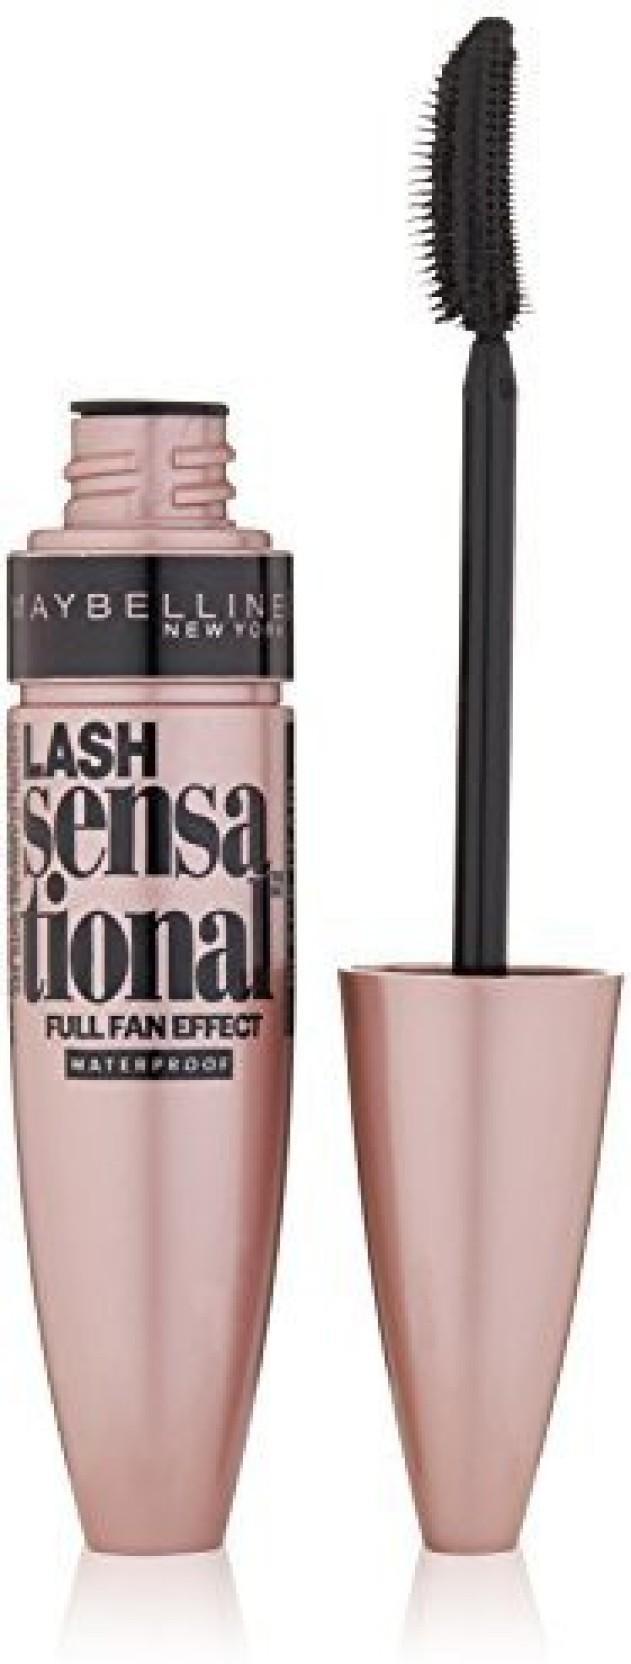 4413abb730b Maybelline Lash Sensational Black Pearl Waterproof Mascara 9 ml. Home